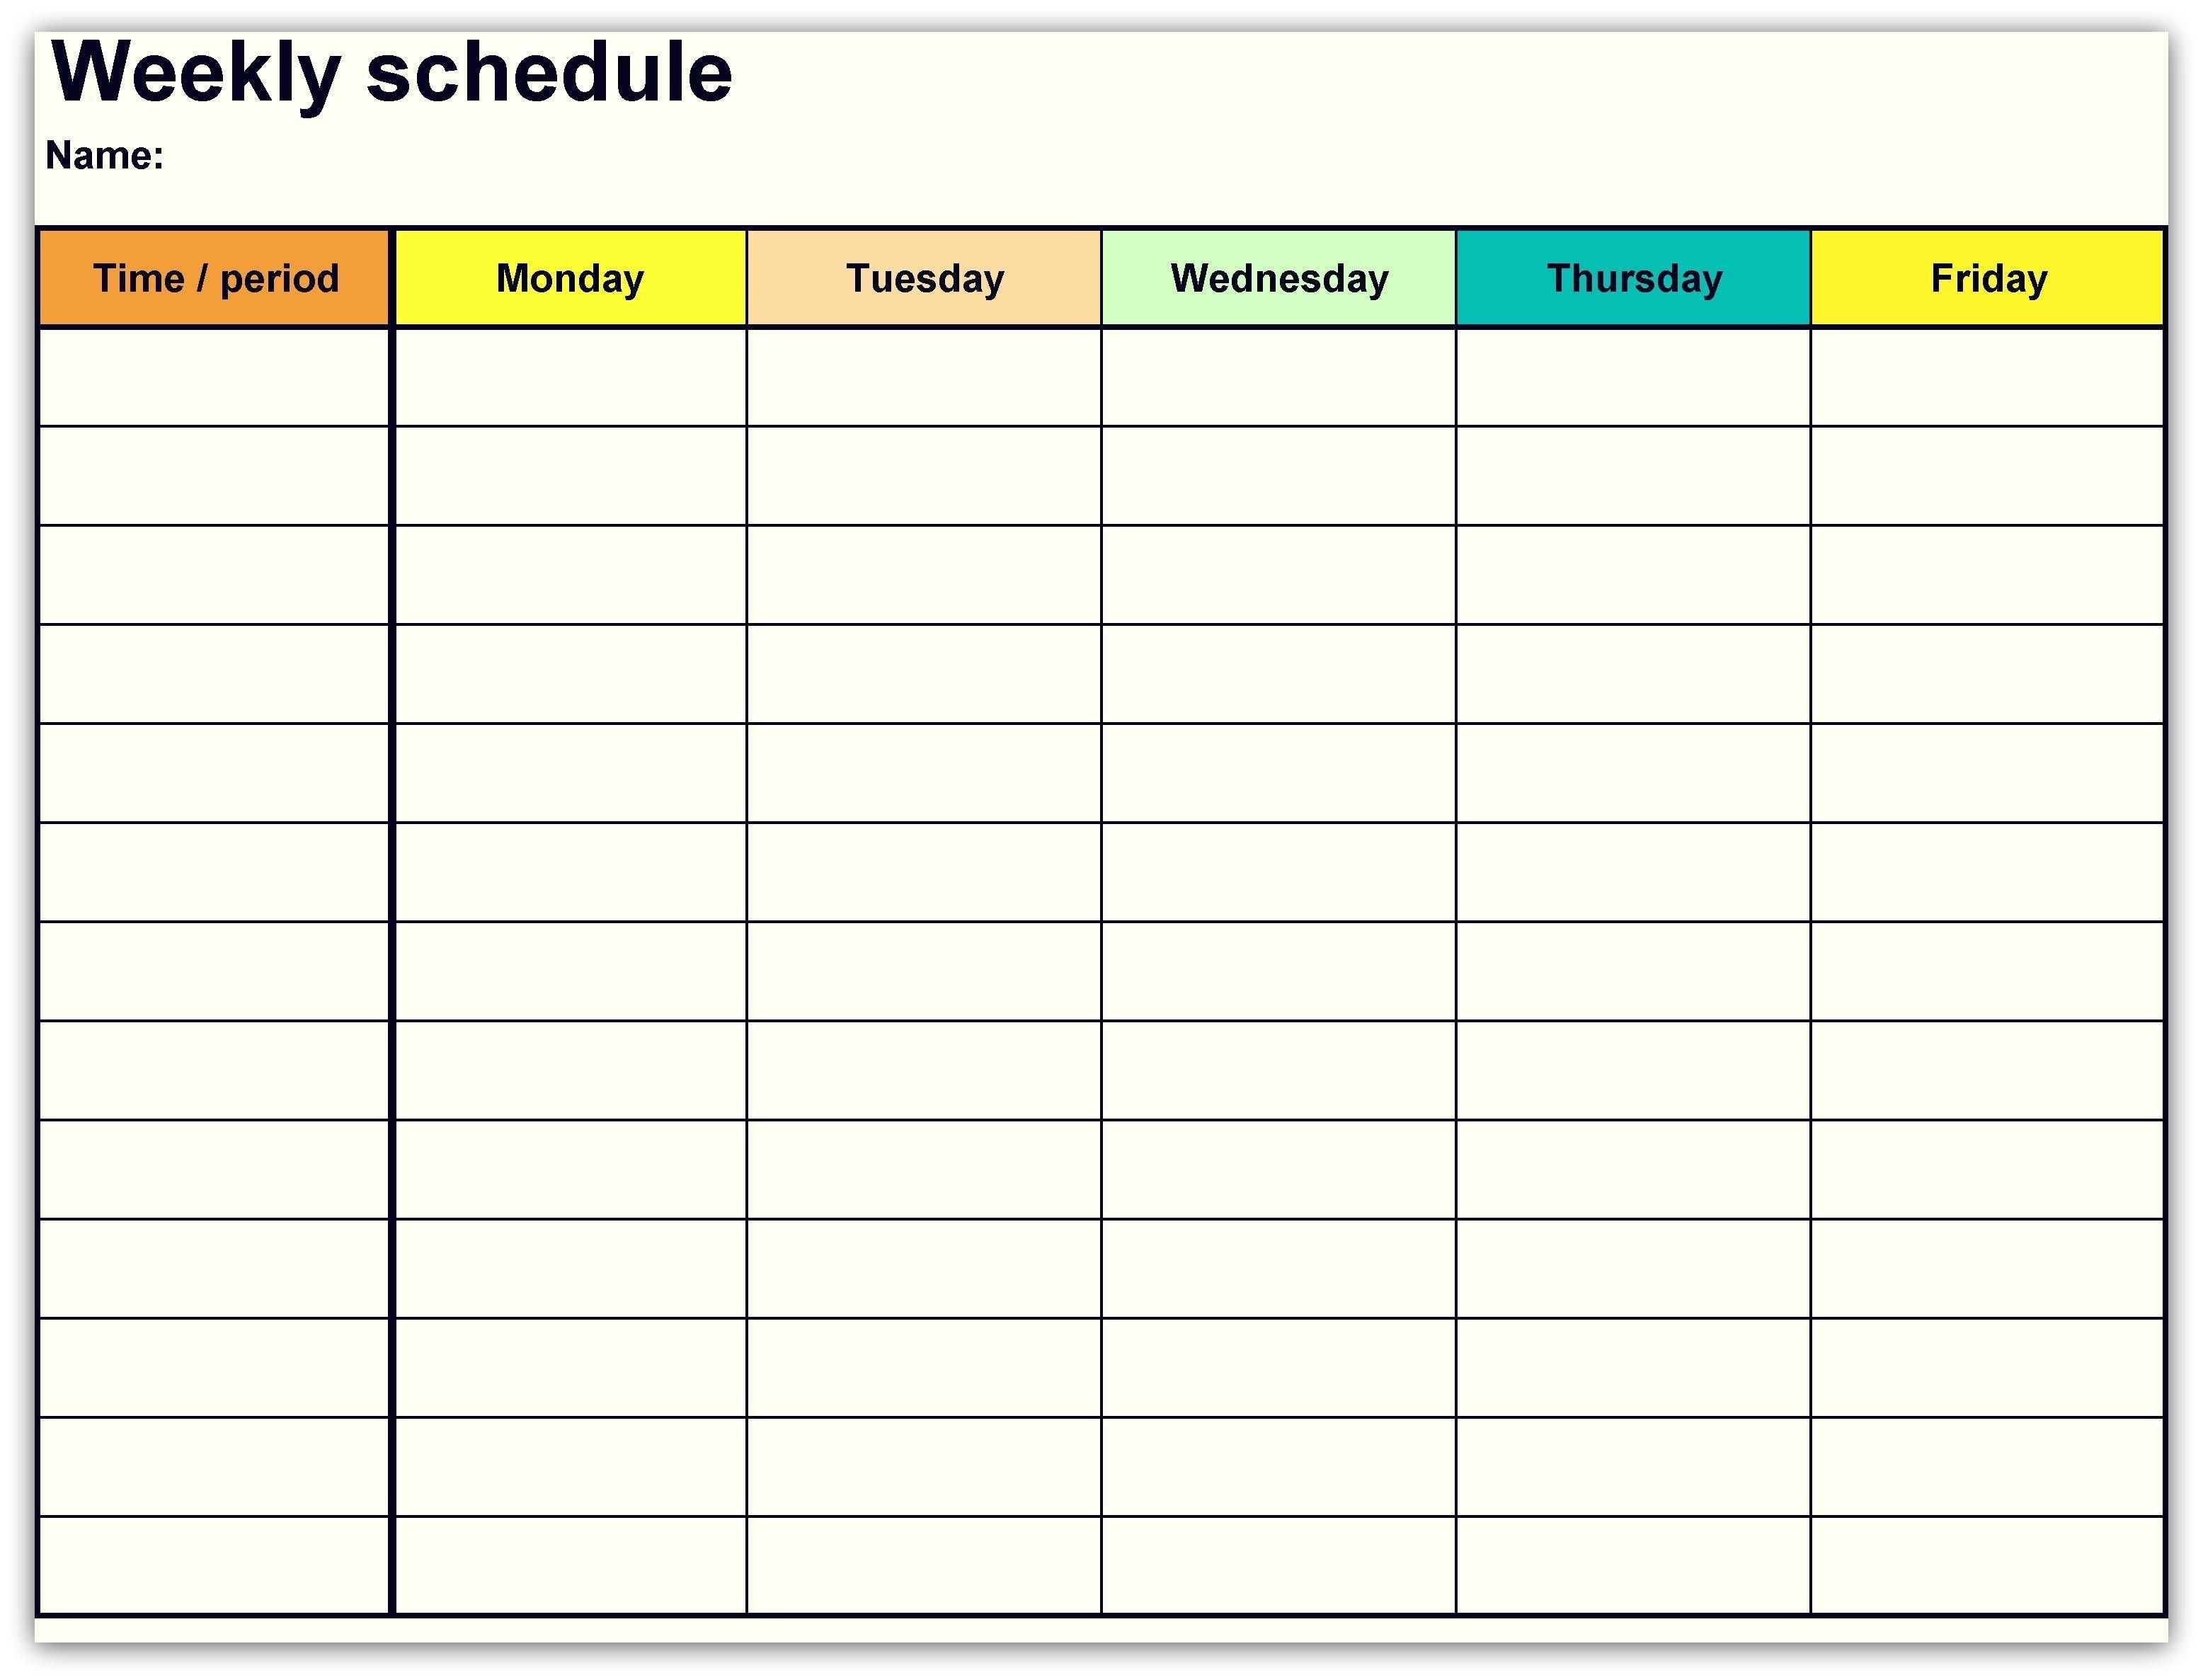 Material Involved With Calendar 2019 Hong Kong Excel - Calendar Calendar 2019 Excel Hong Kong